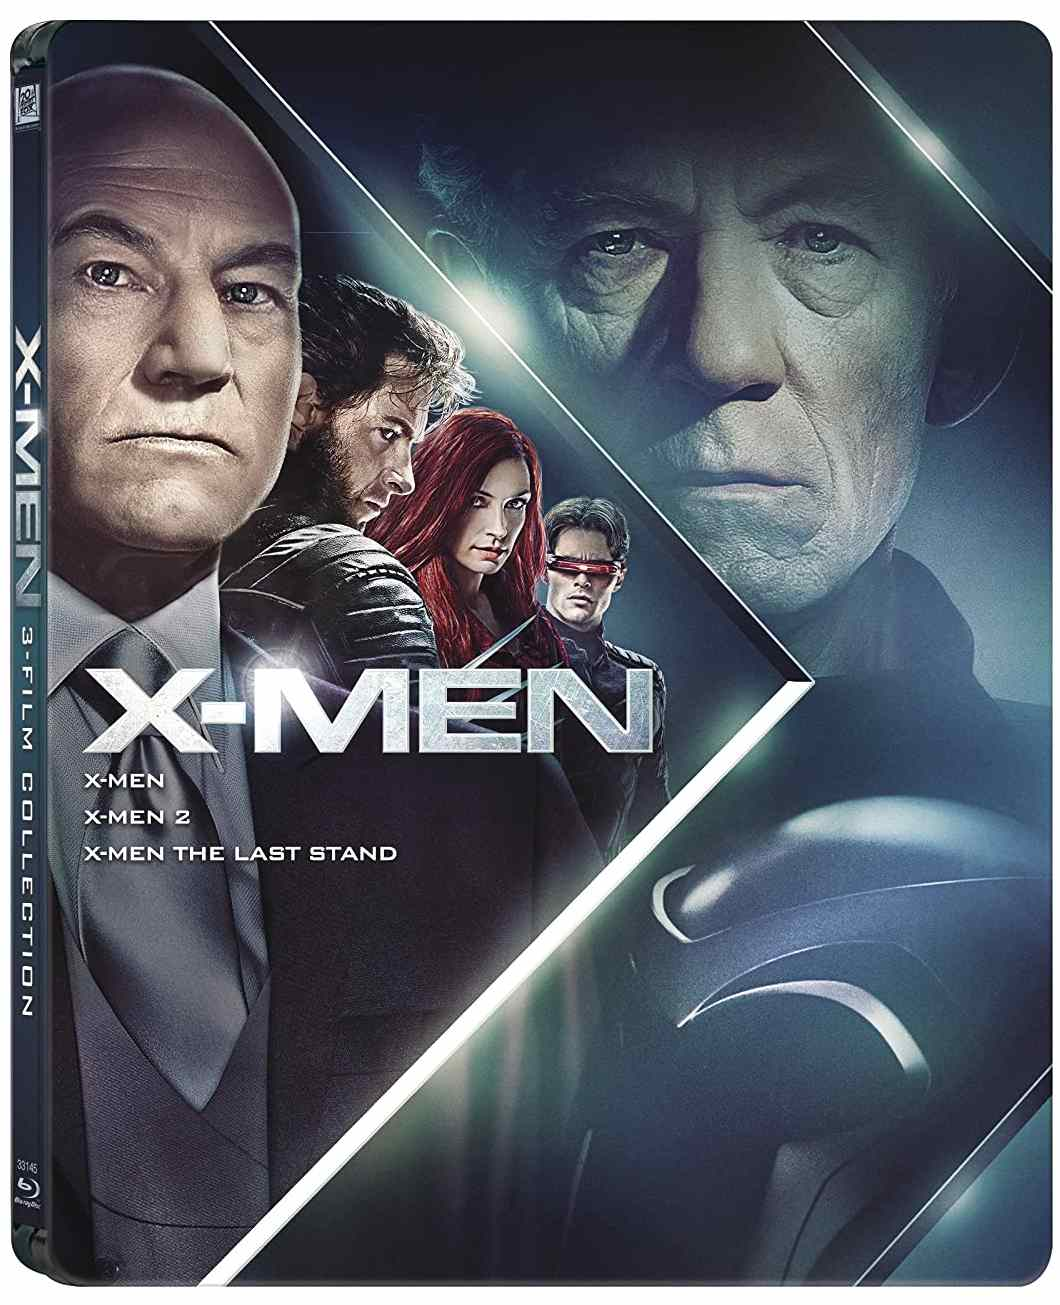 X-MEN TRILOGIE (X-Men, X-Men 2, Poslední vzdor) - Blu-ray STEELBOOK